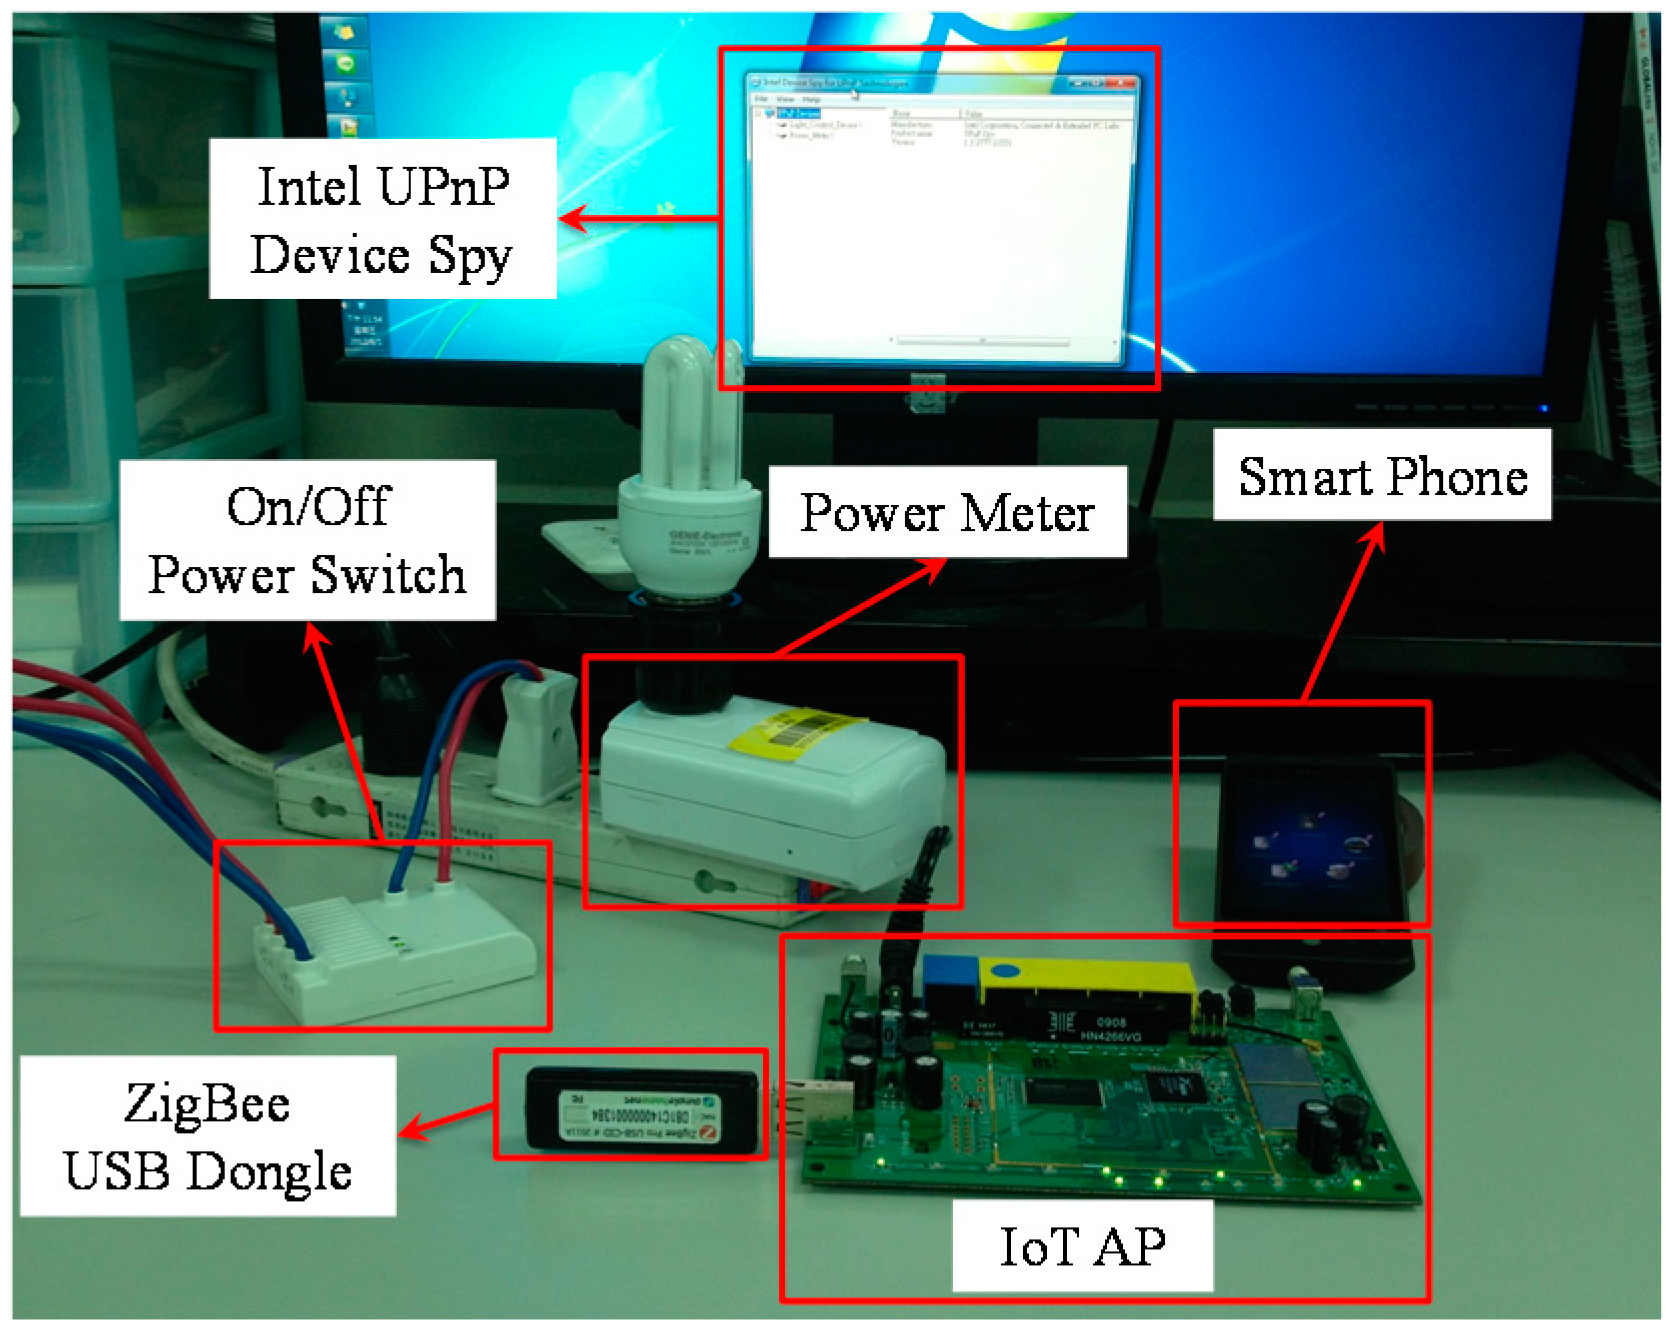 intel device spy upnp